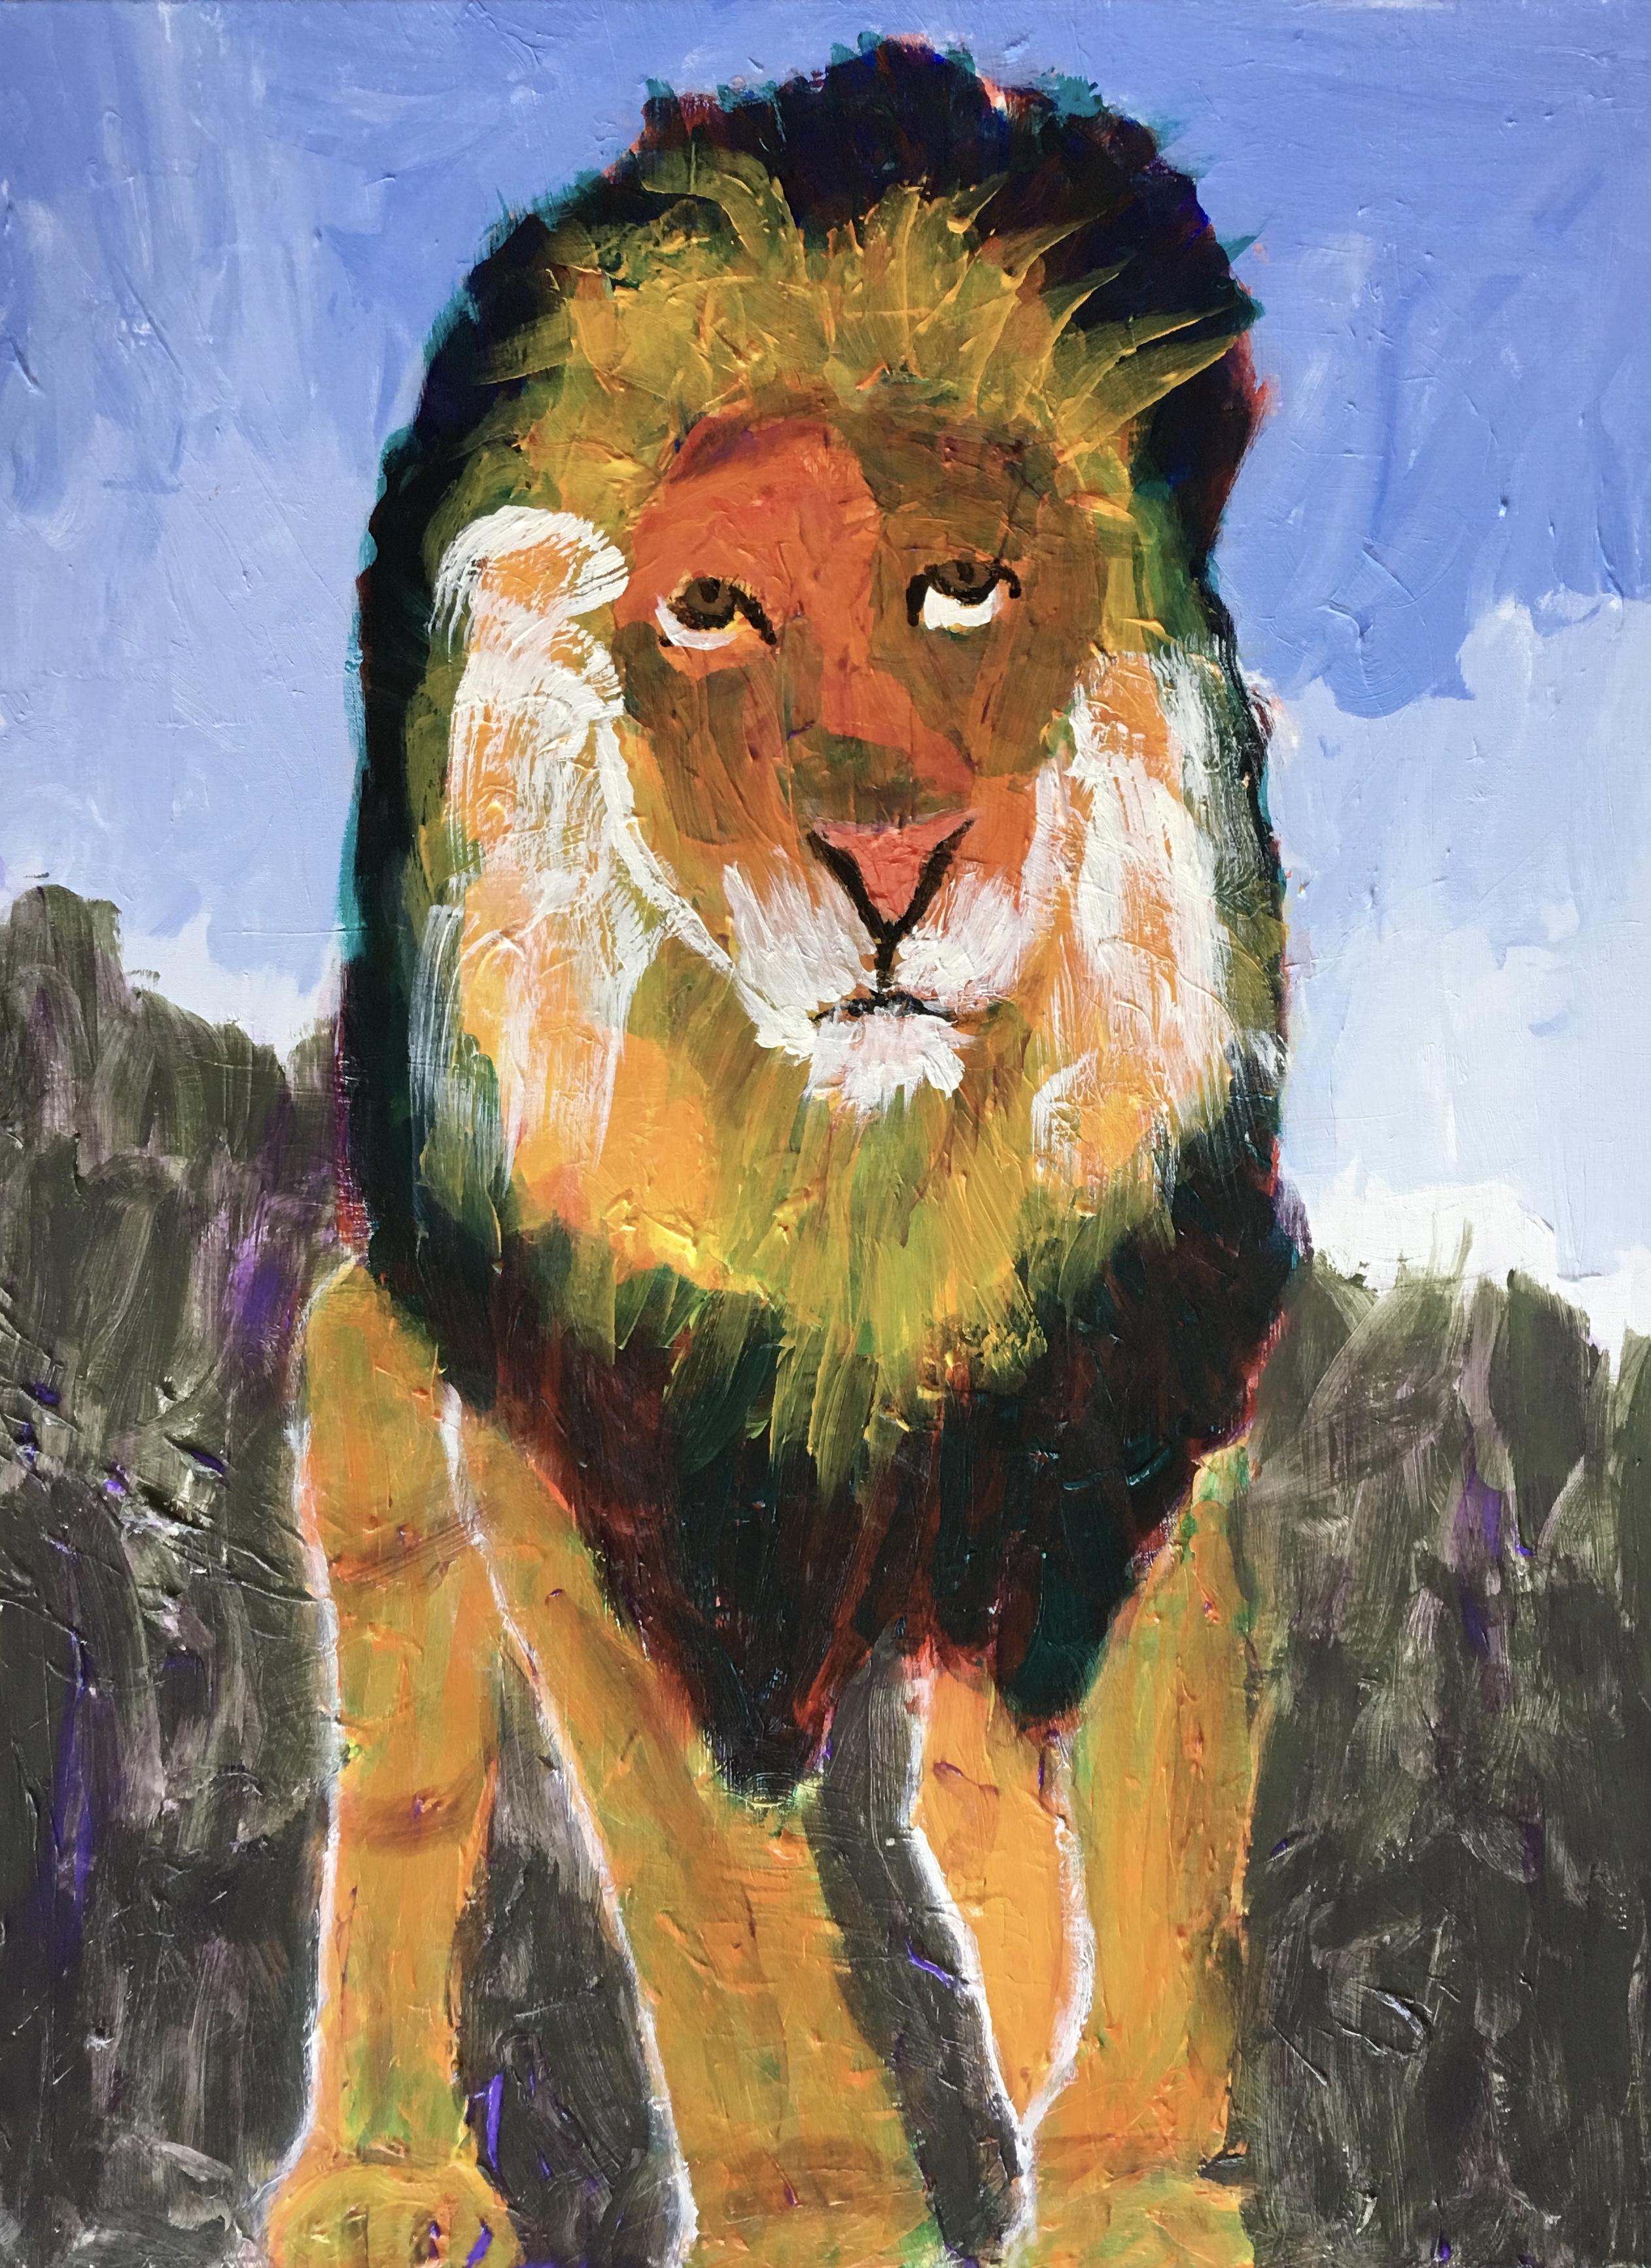 Big Lion King - - Original for Sale - Prints Available